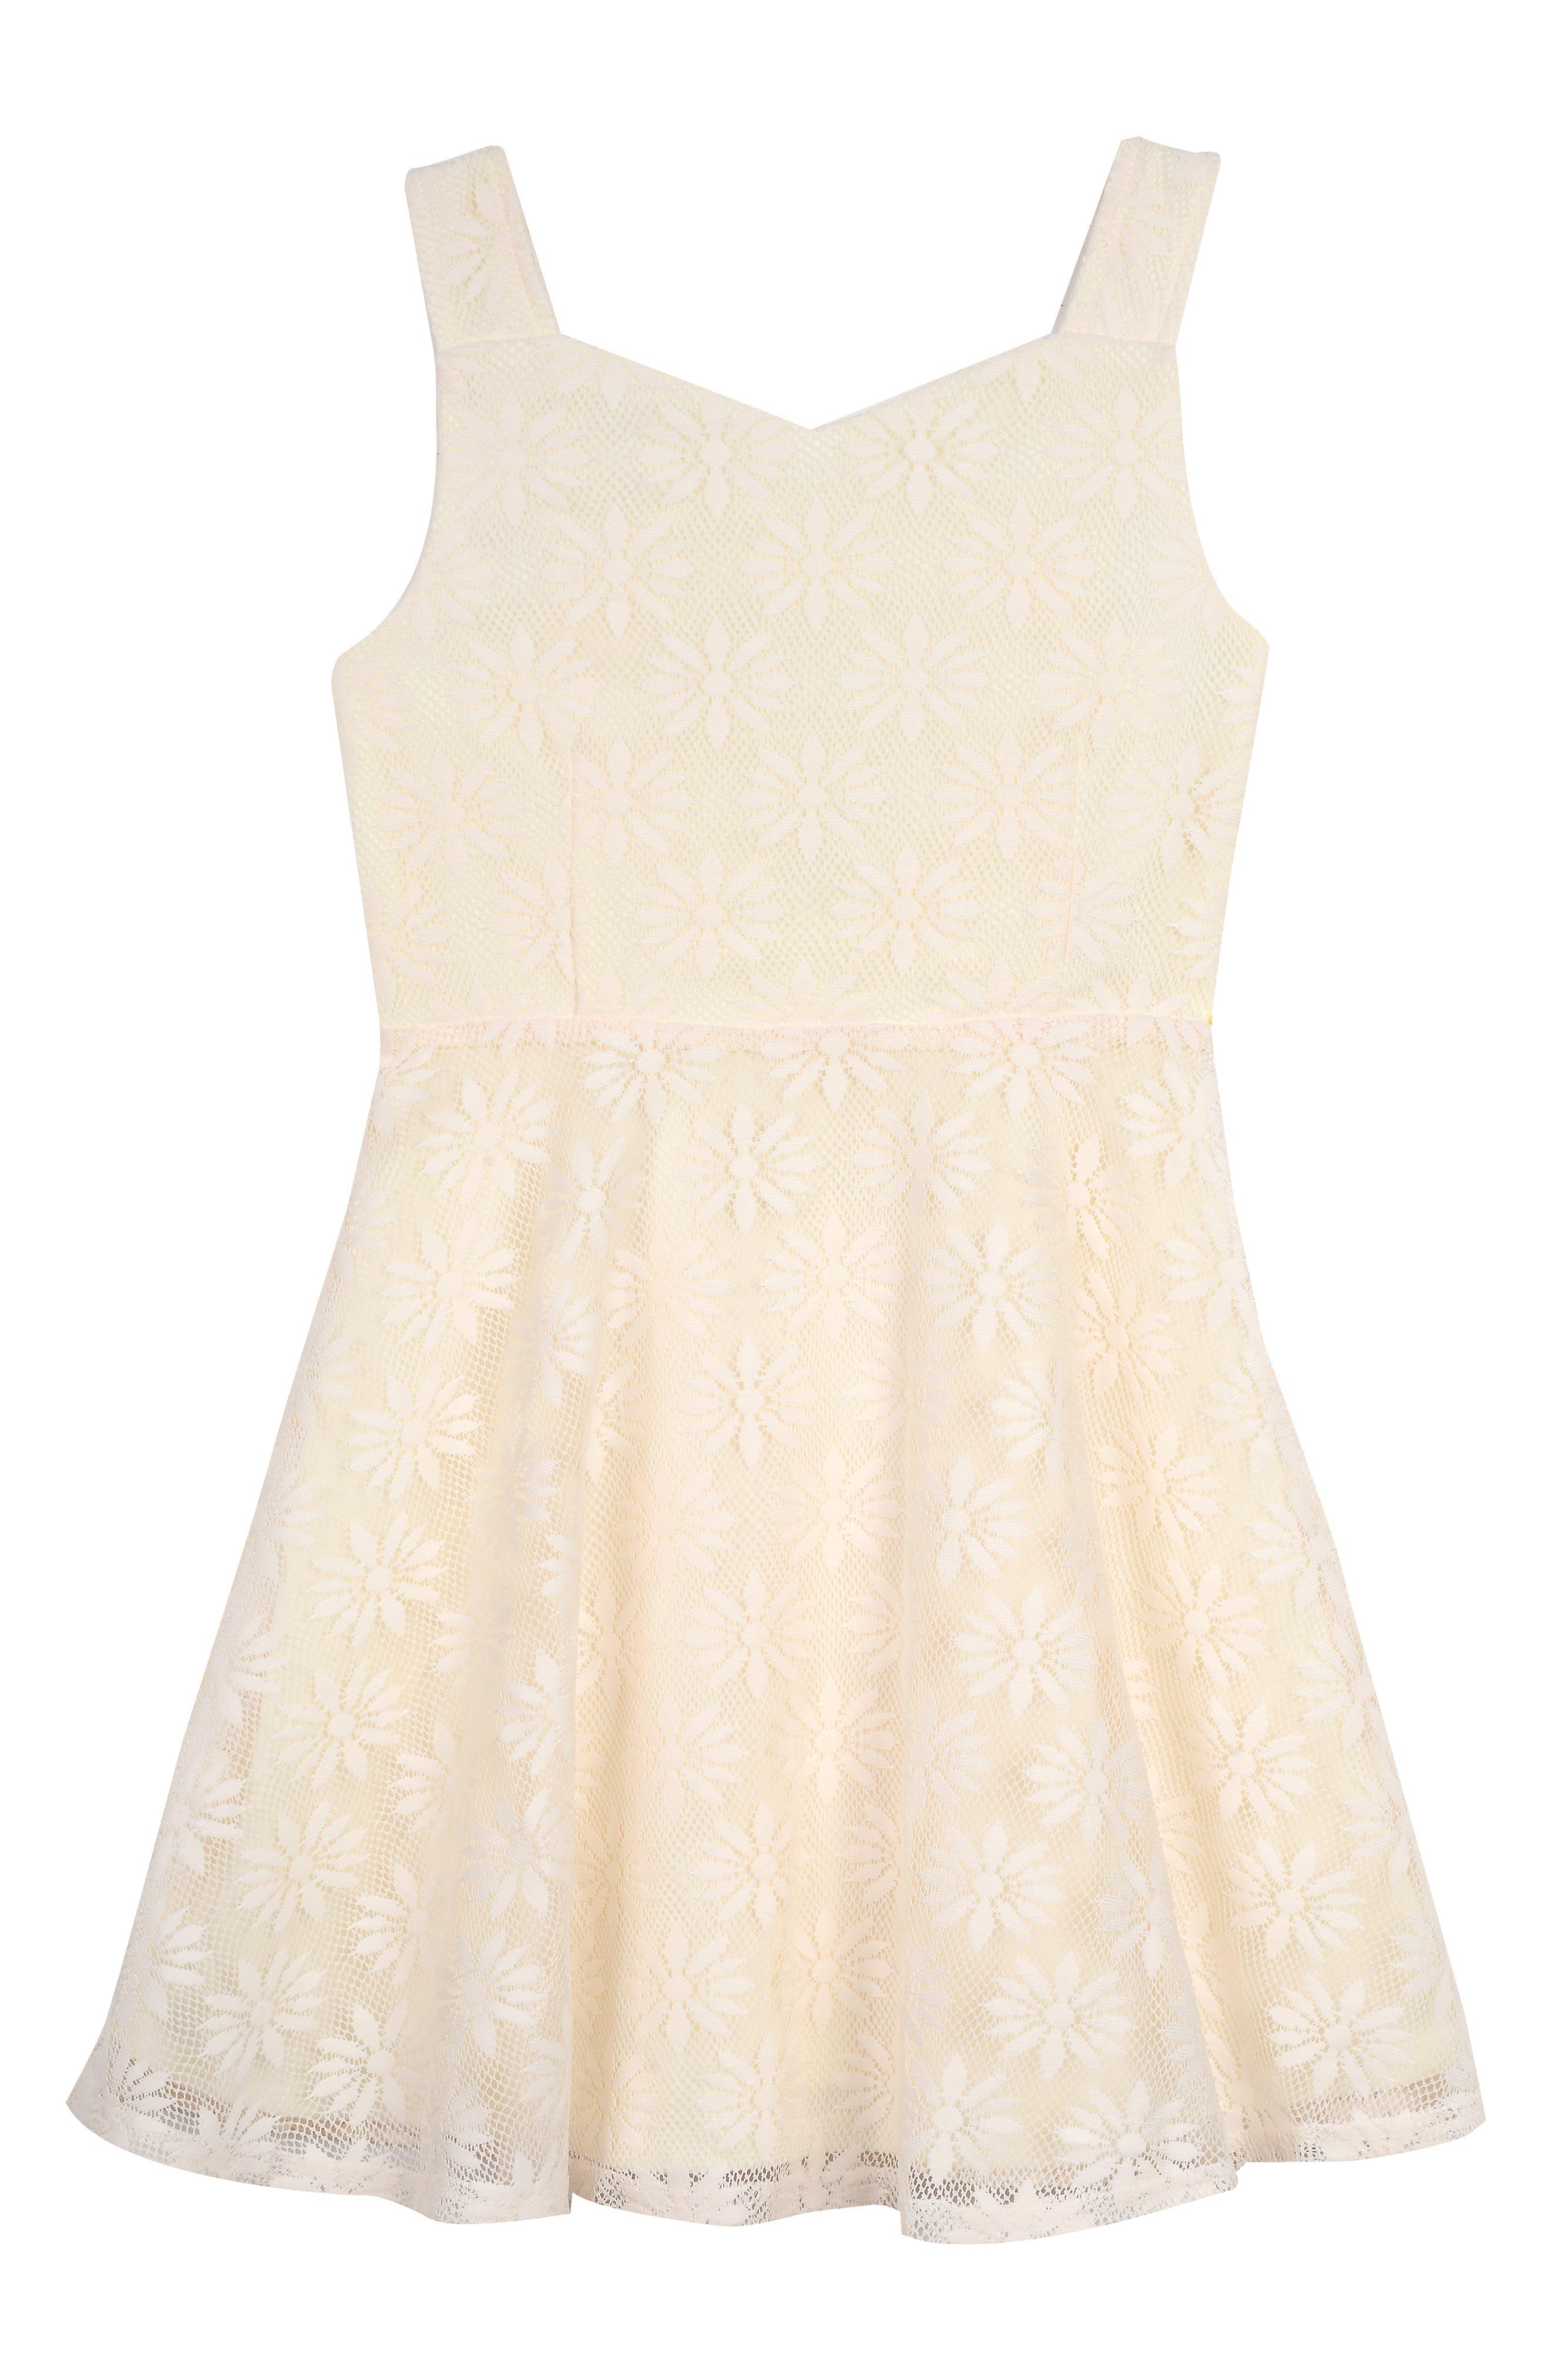 PIPPA & JULIE Daisy Mesh Dress, Main, color, YELLOW